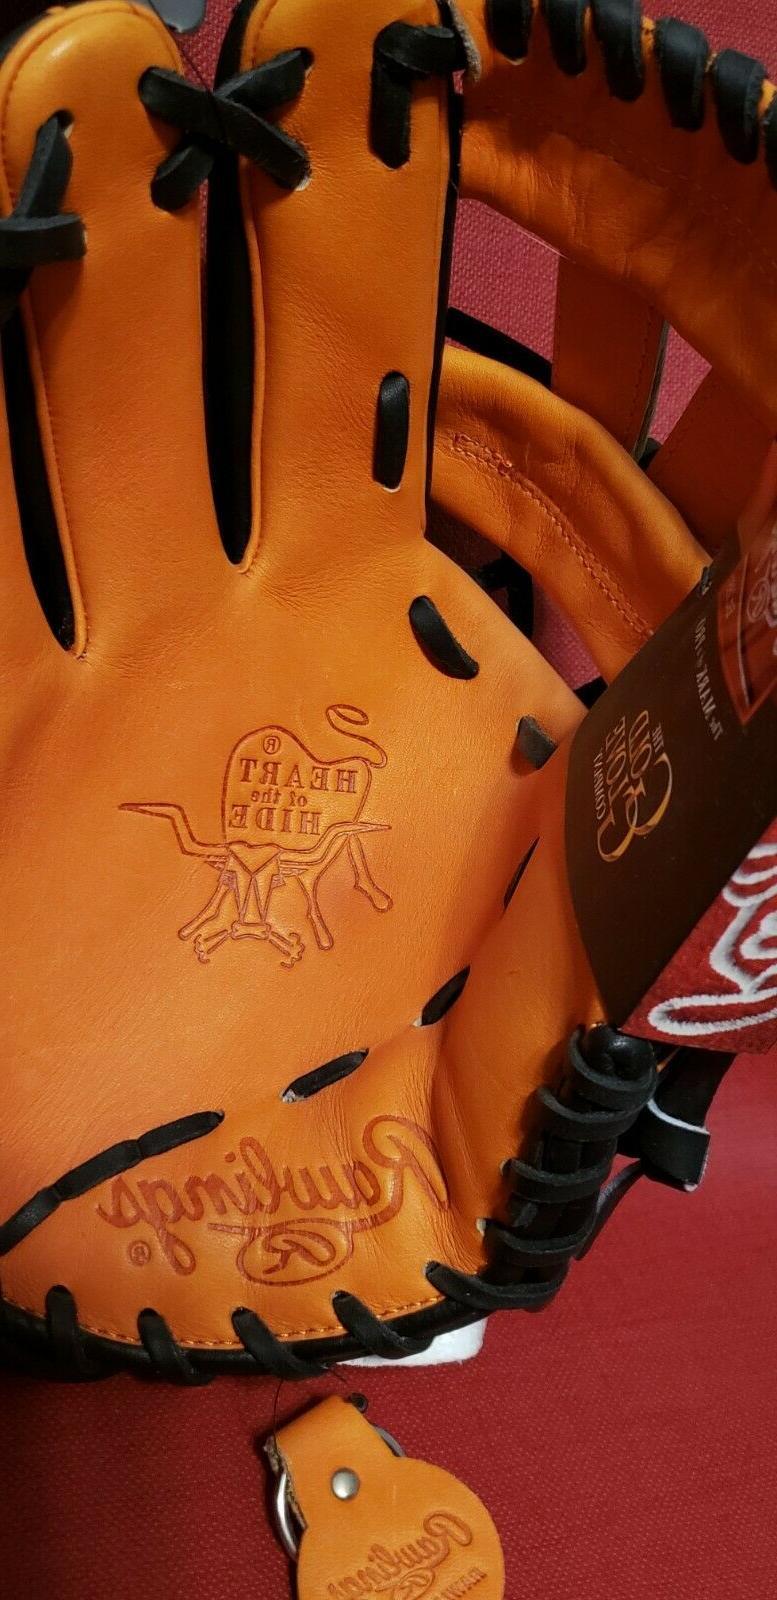 Rawlings PRONP2-7JO Heart the Limited Baseball RHT